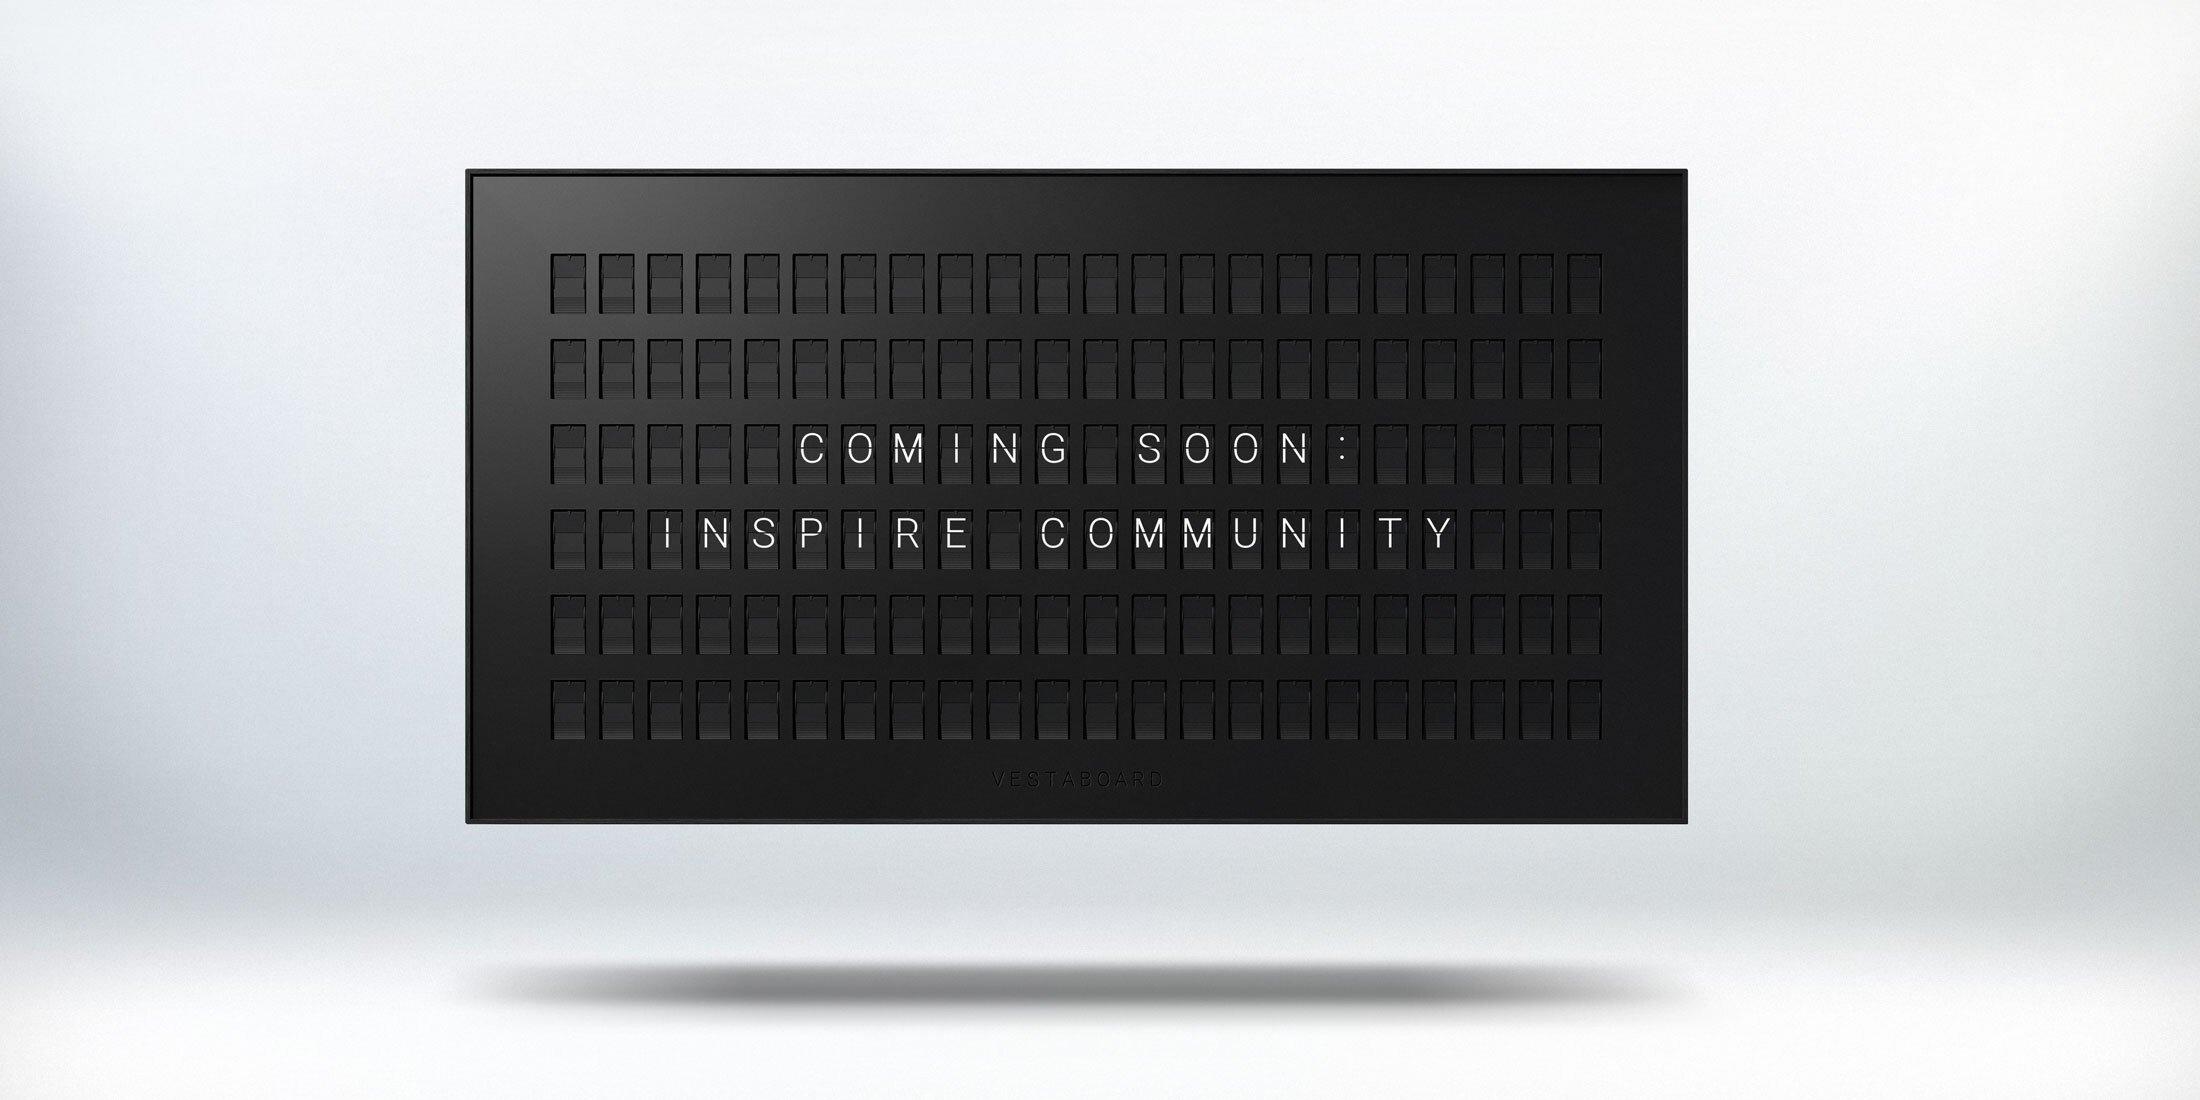 R-inspire-com-soon